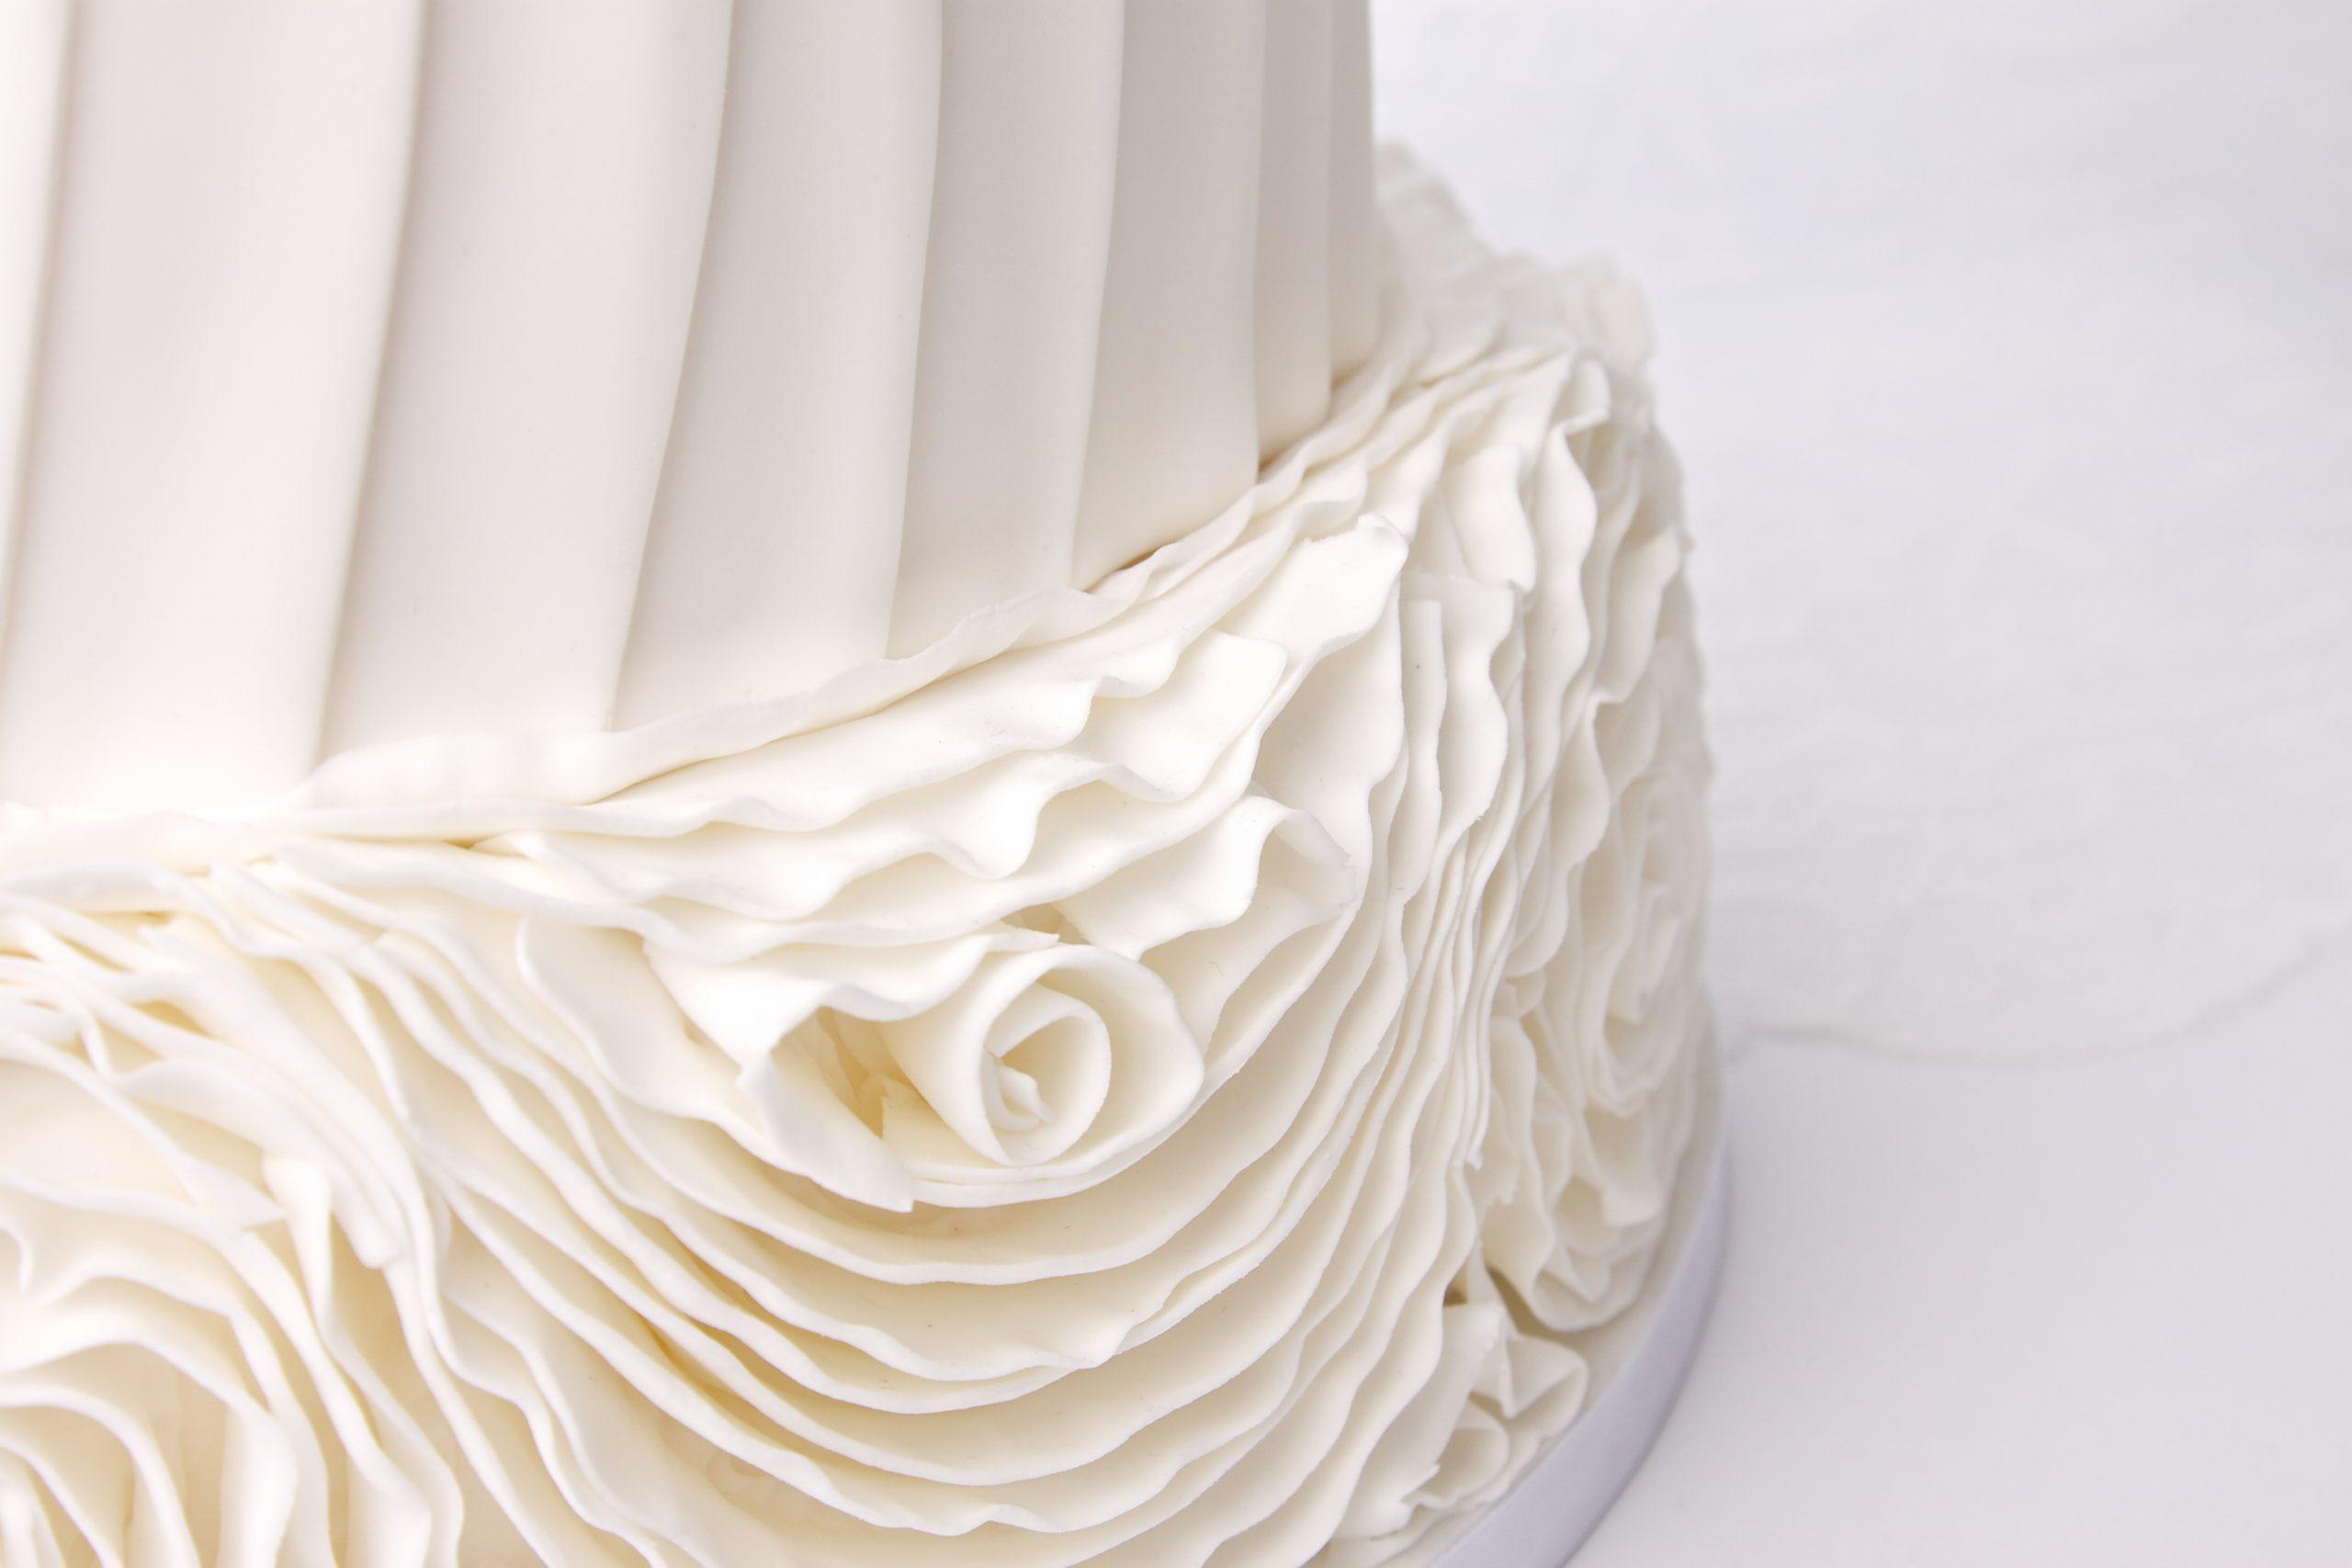 cake photography close up